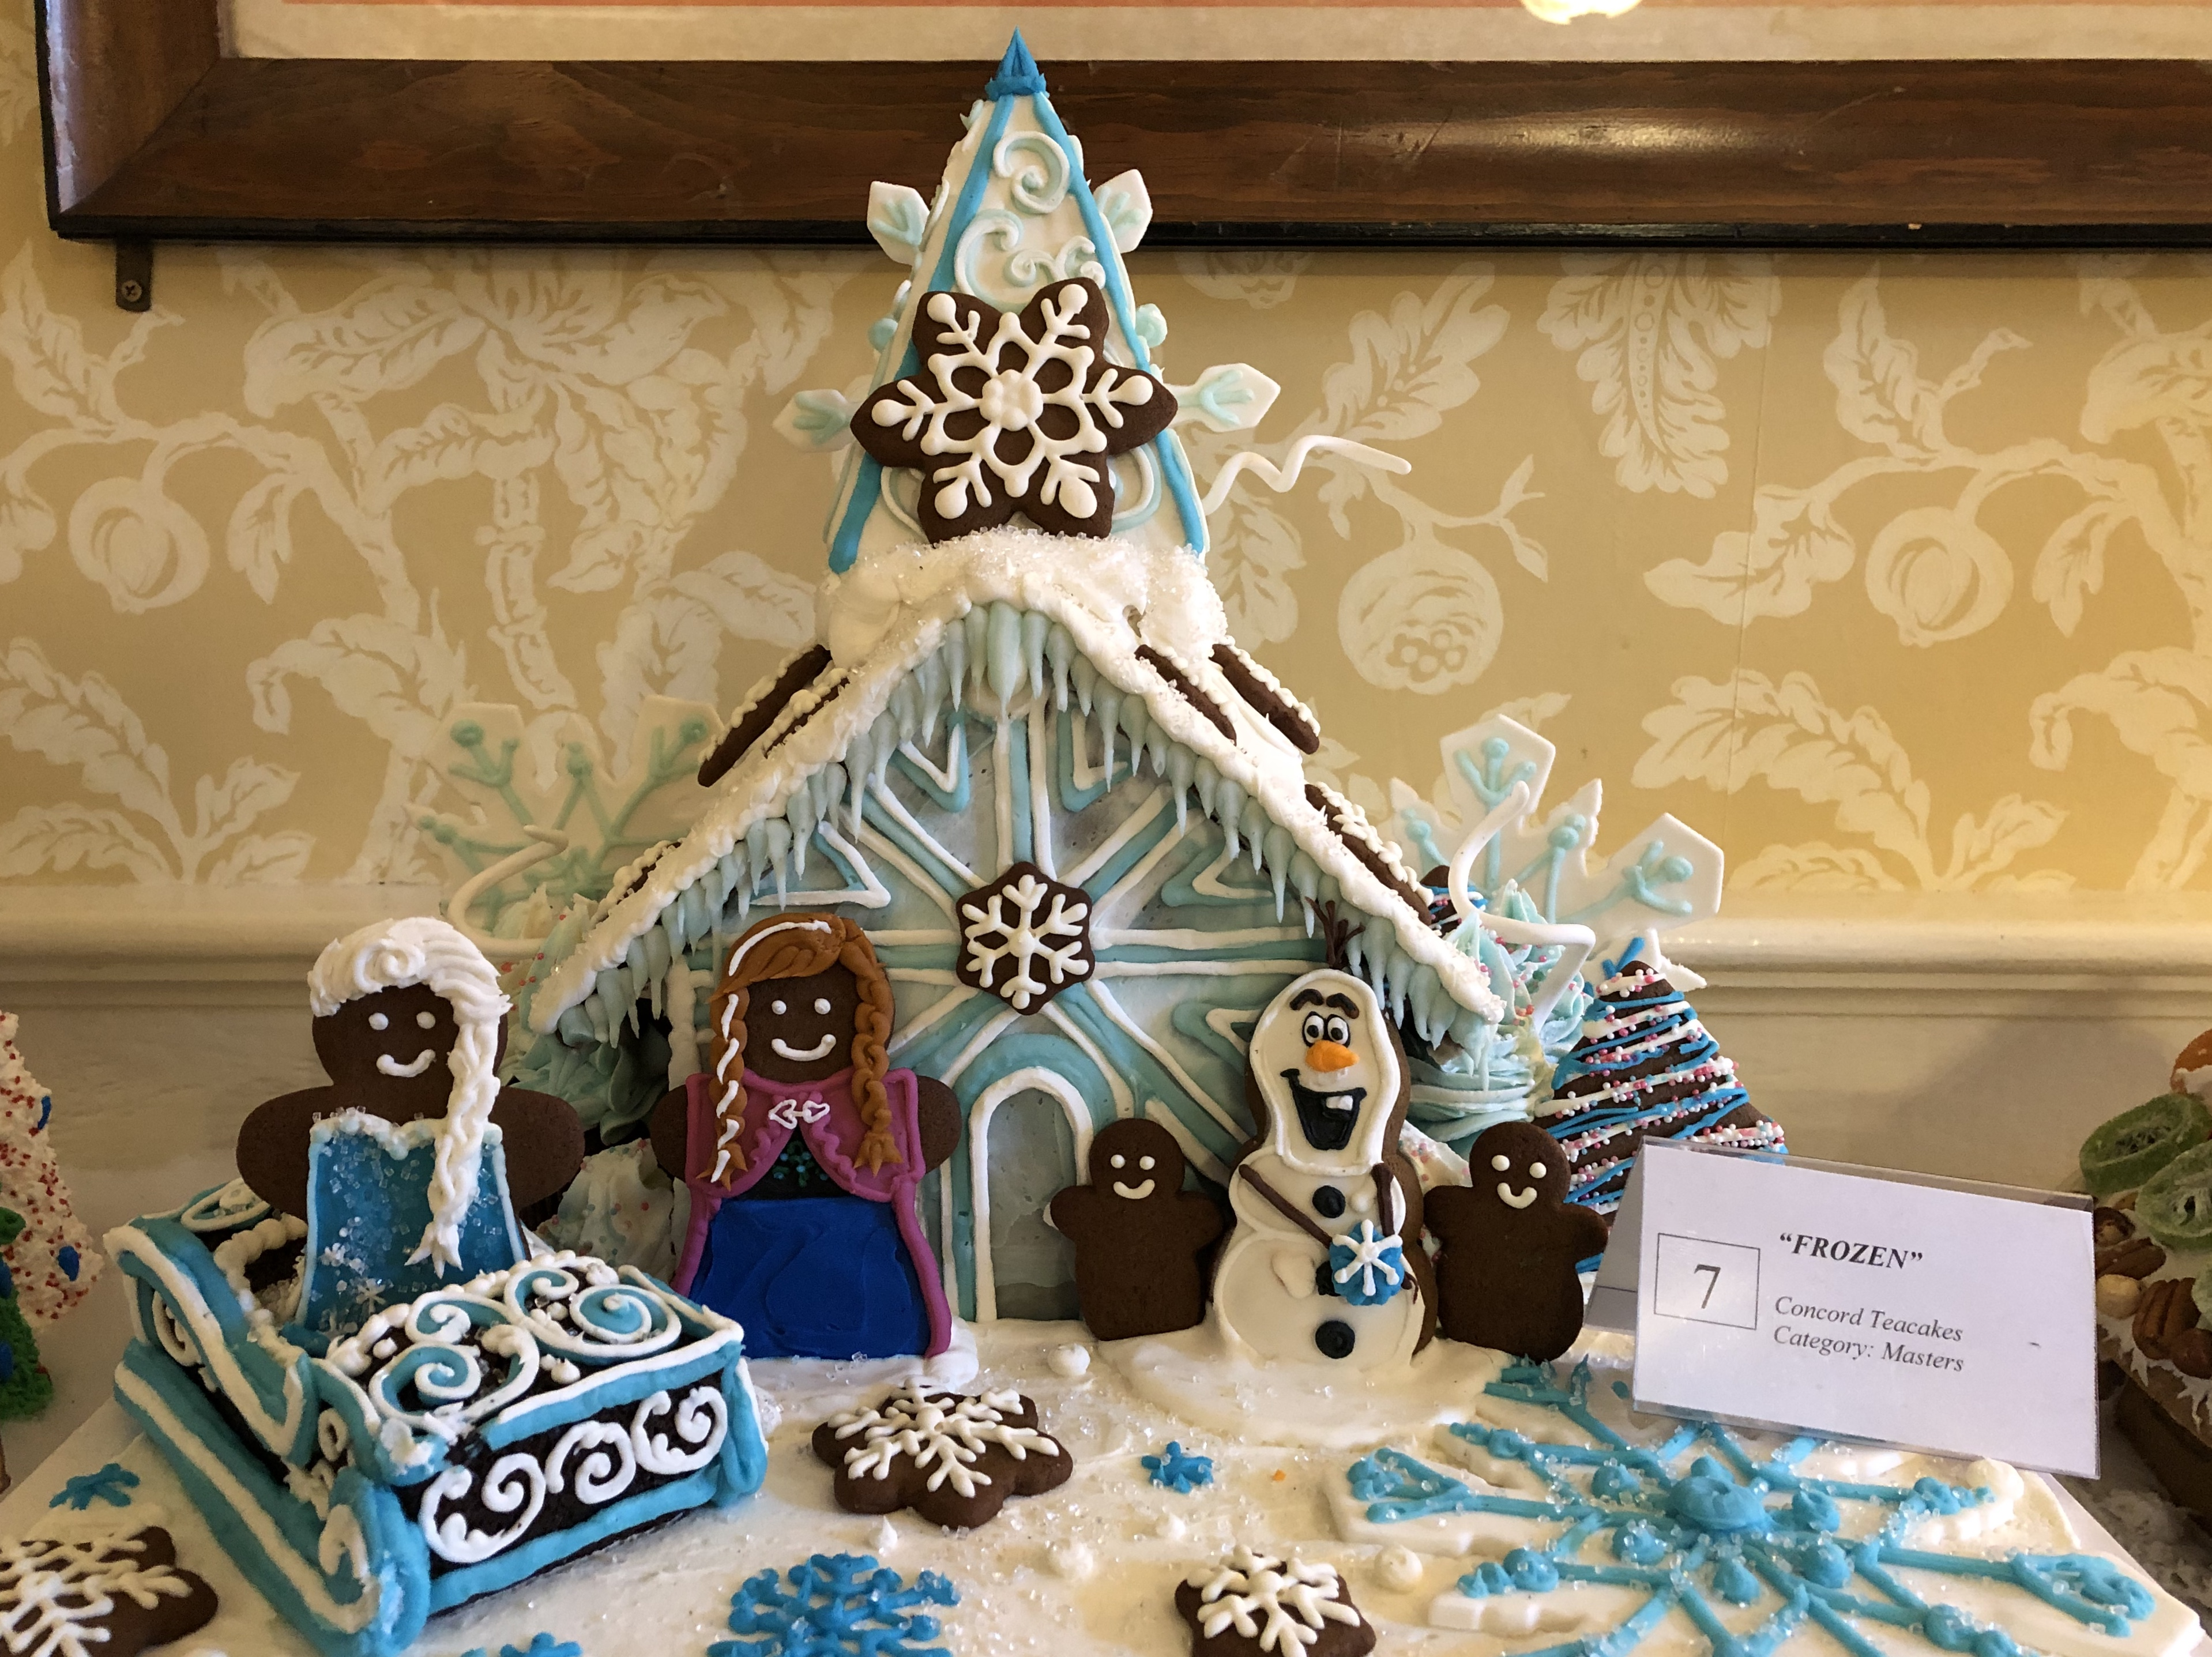 121219-Frozen-movie-as-Gingerbread